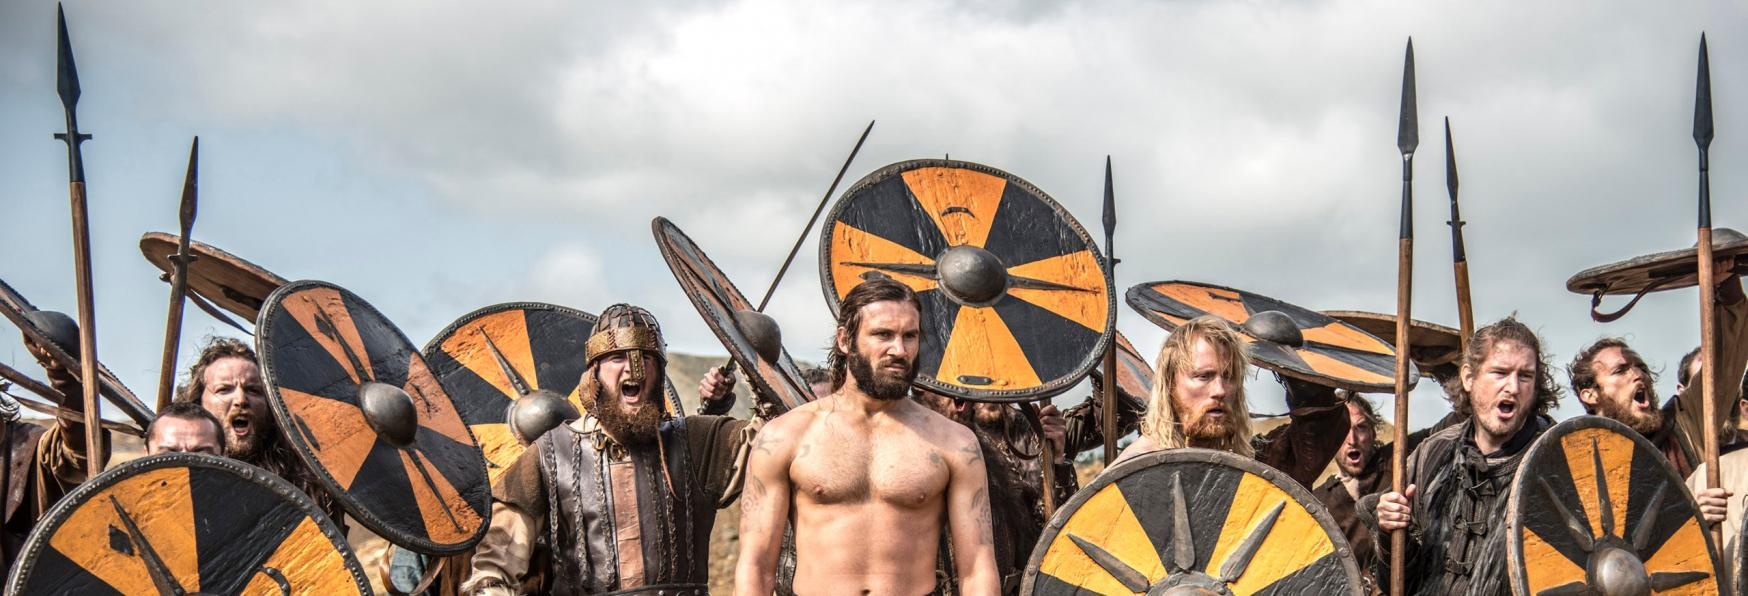 Vikings: Valhalla - un Video Anteprima della Serie TV Spin-off targata Netflix